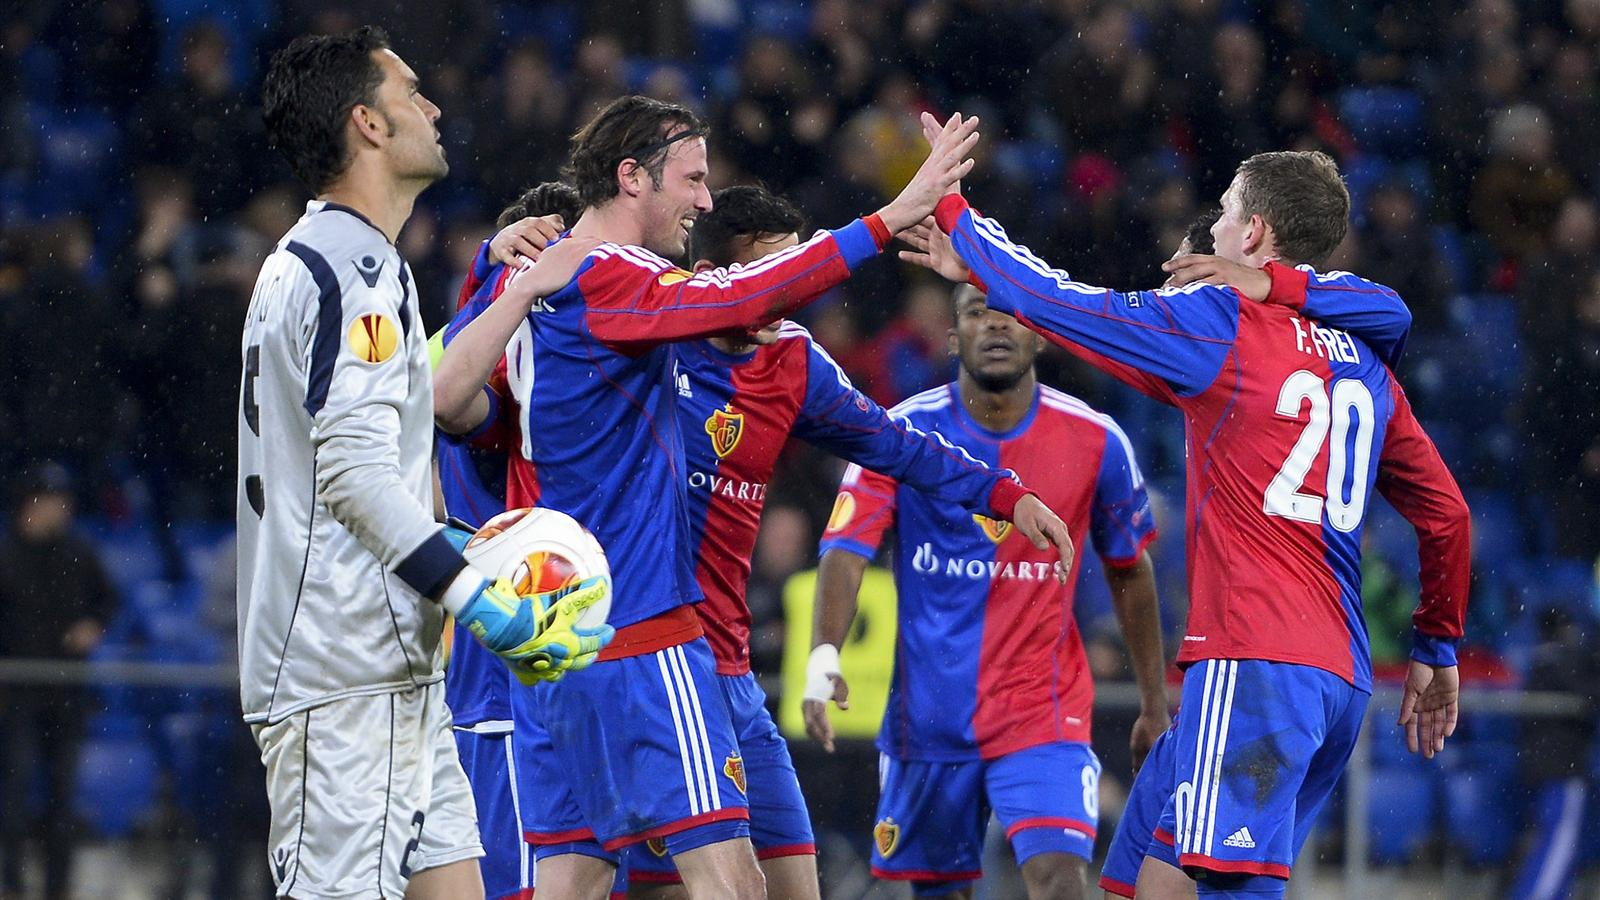 Match FC Bâle vs Liverpool en direct live streaming